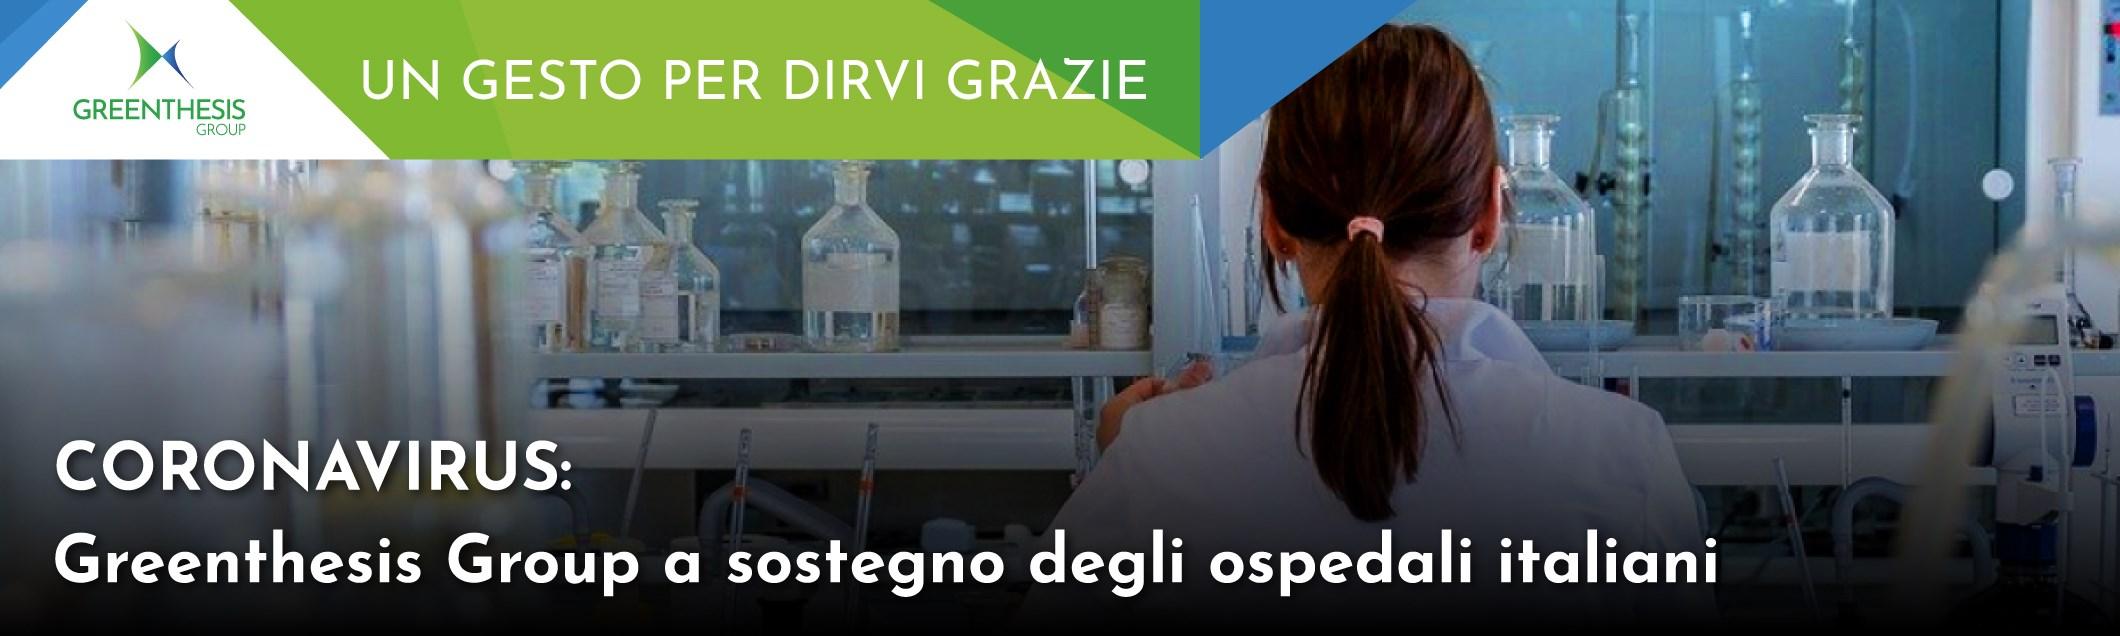 Coronavirus: Greenthesis Group a sostegno degli ospedali italiani